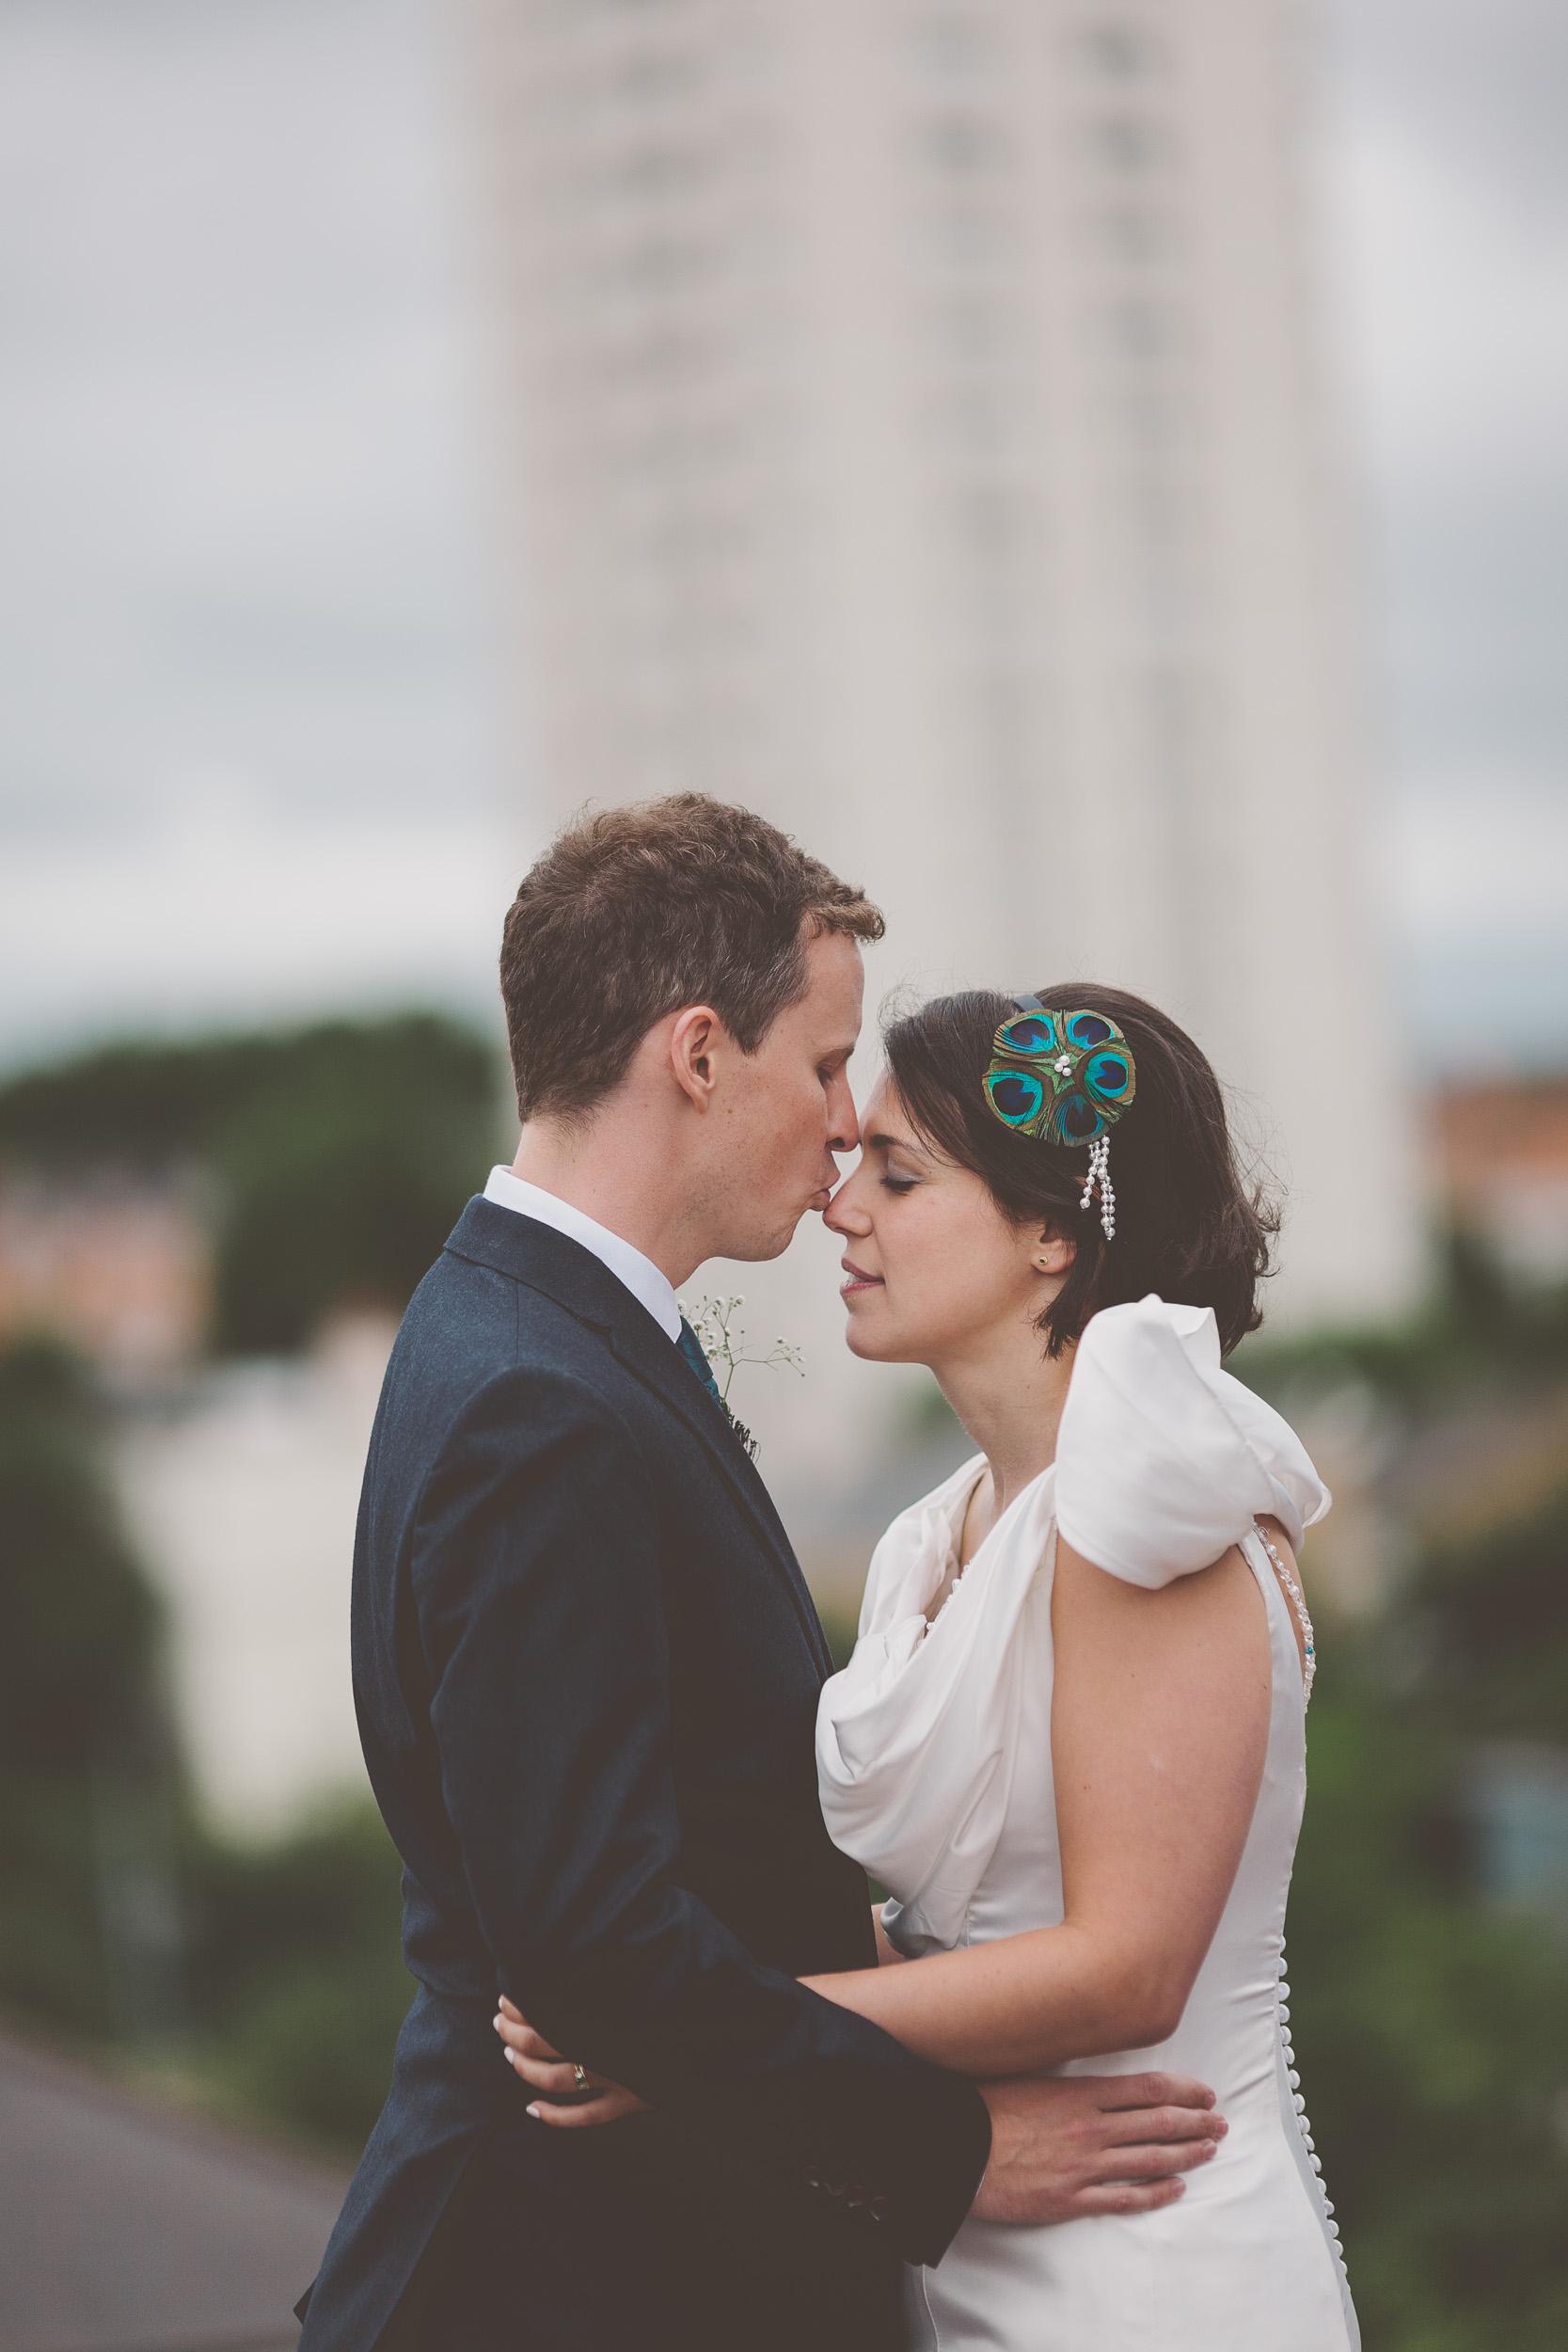 islington-town-hall-4th-floor-studios-wedding283.jpg